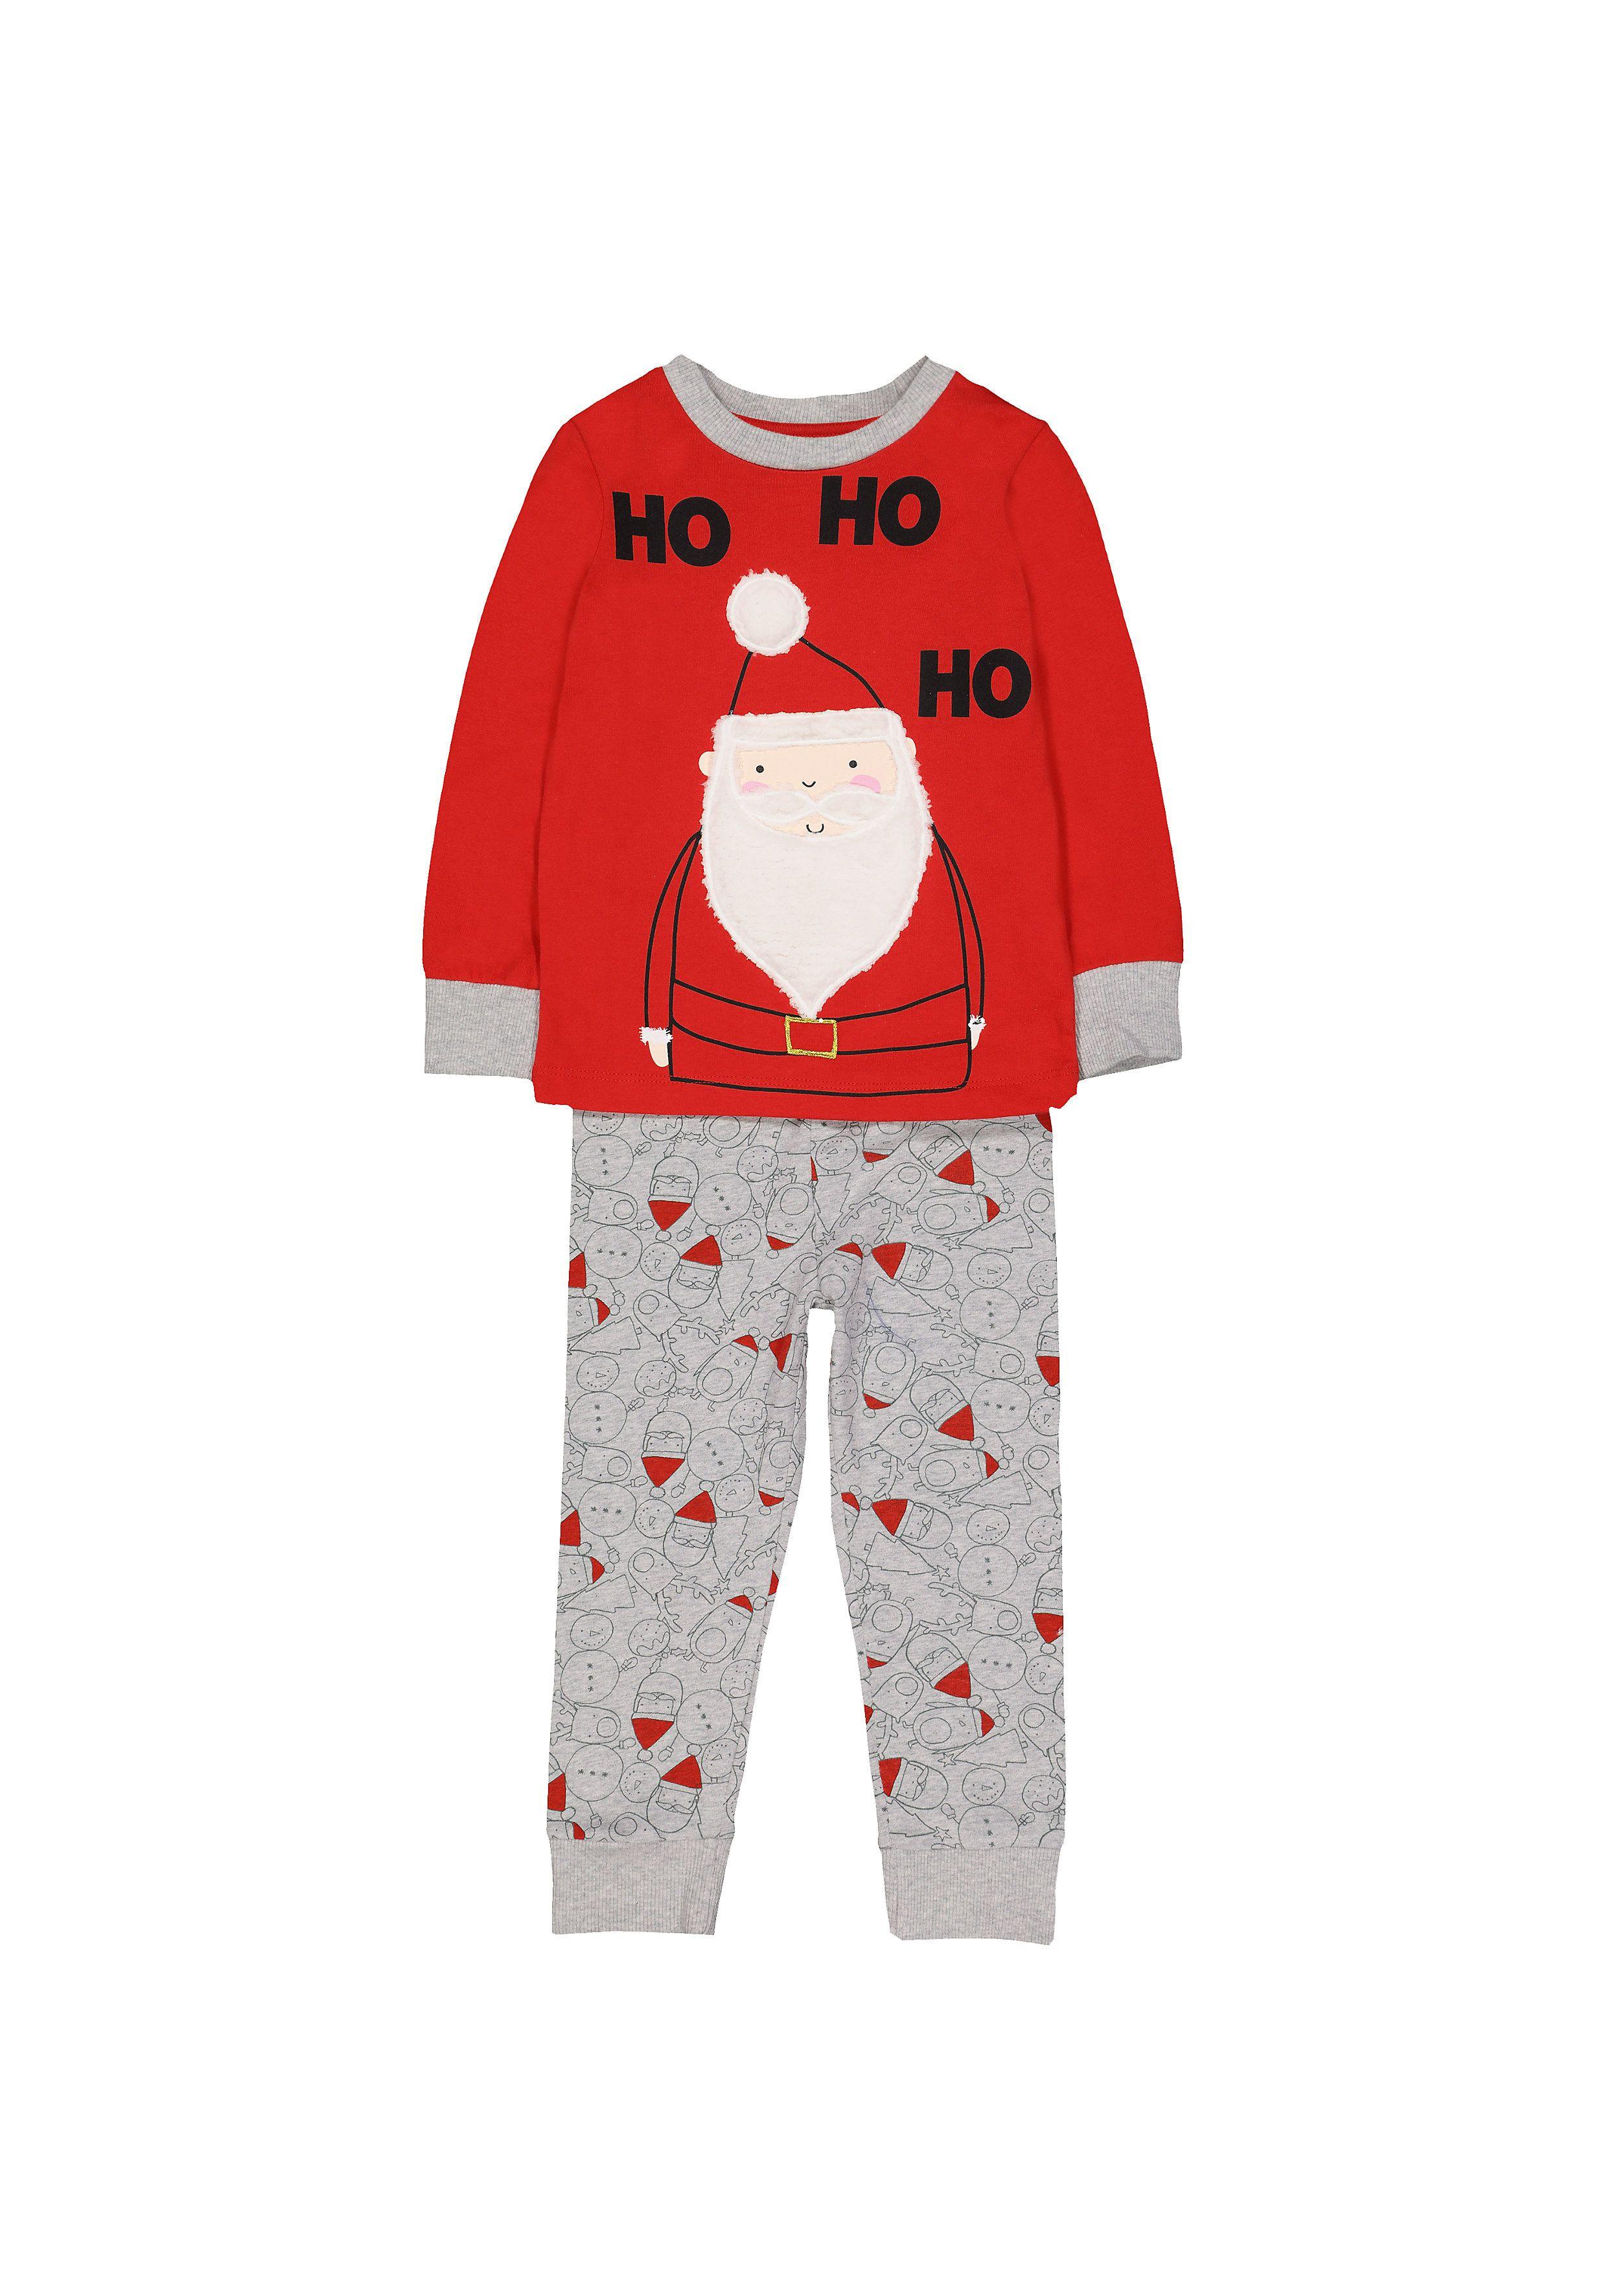 HO HO HO ! Christmas pyjamas. Boys nightwear, Pyjamas